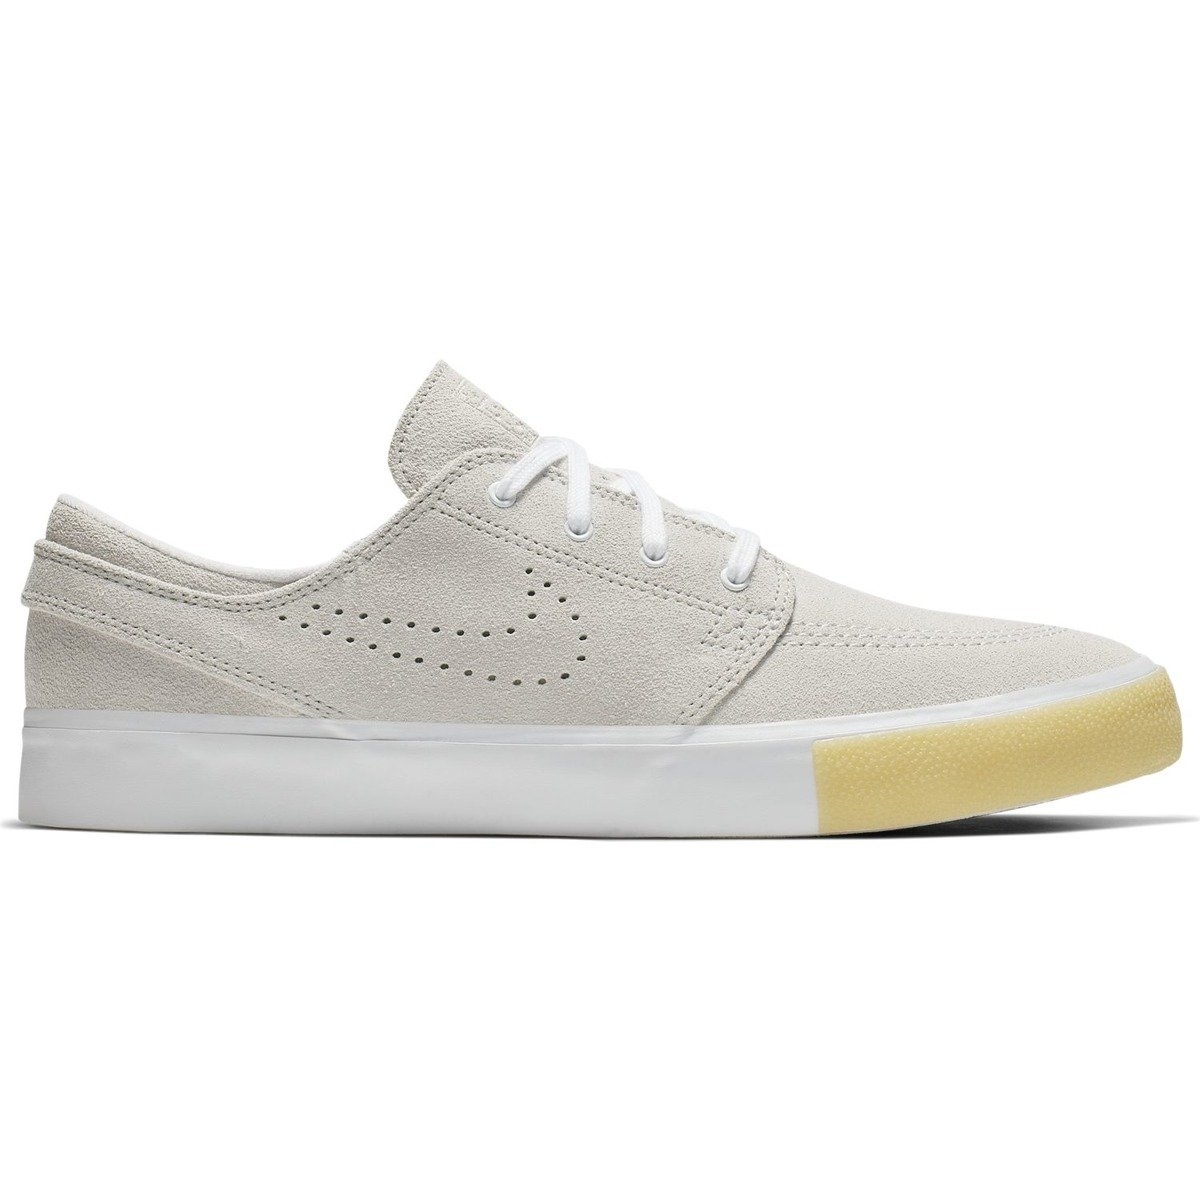 new product 74c58 7c256 Nike Sb Zoom Stefan Janoski RM SE White white-vast Grey-gum Yellow white    Shoes   Nike SB Shoes   nike janoski Brands   Nike SB   Skateshop  Miniramp.pl